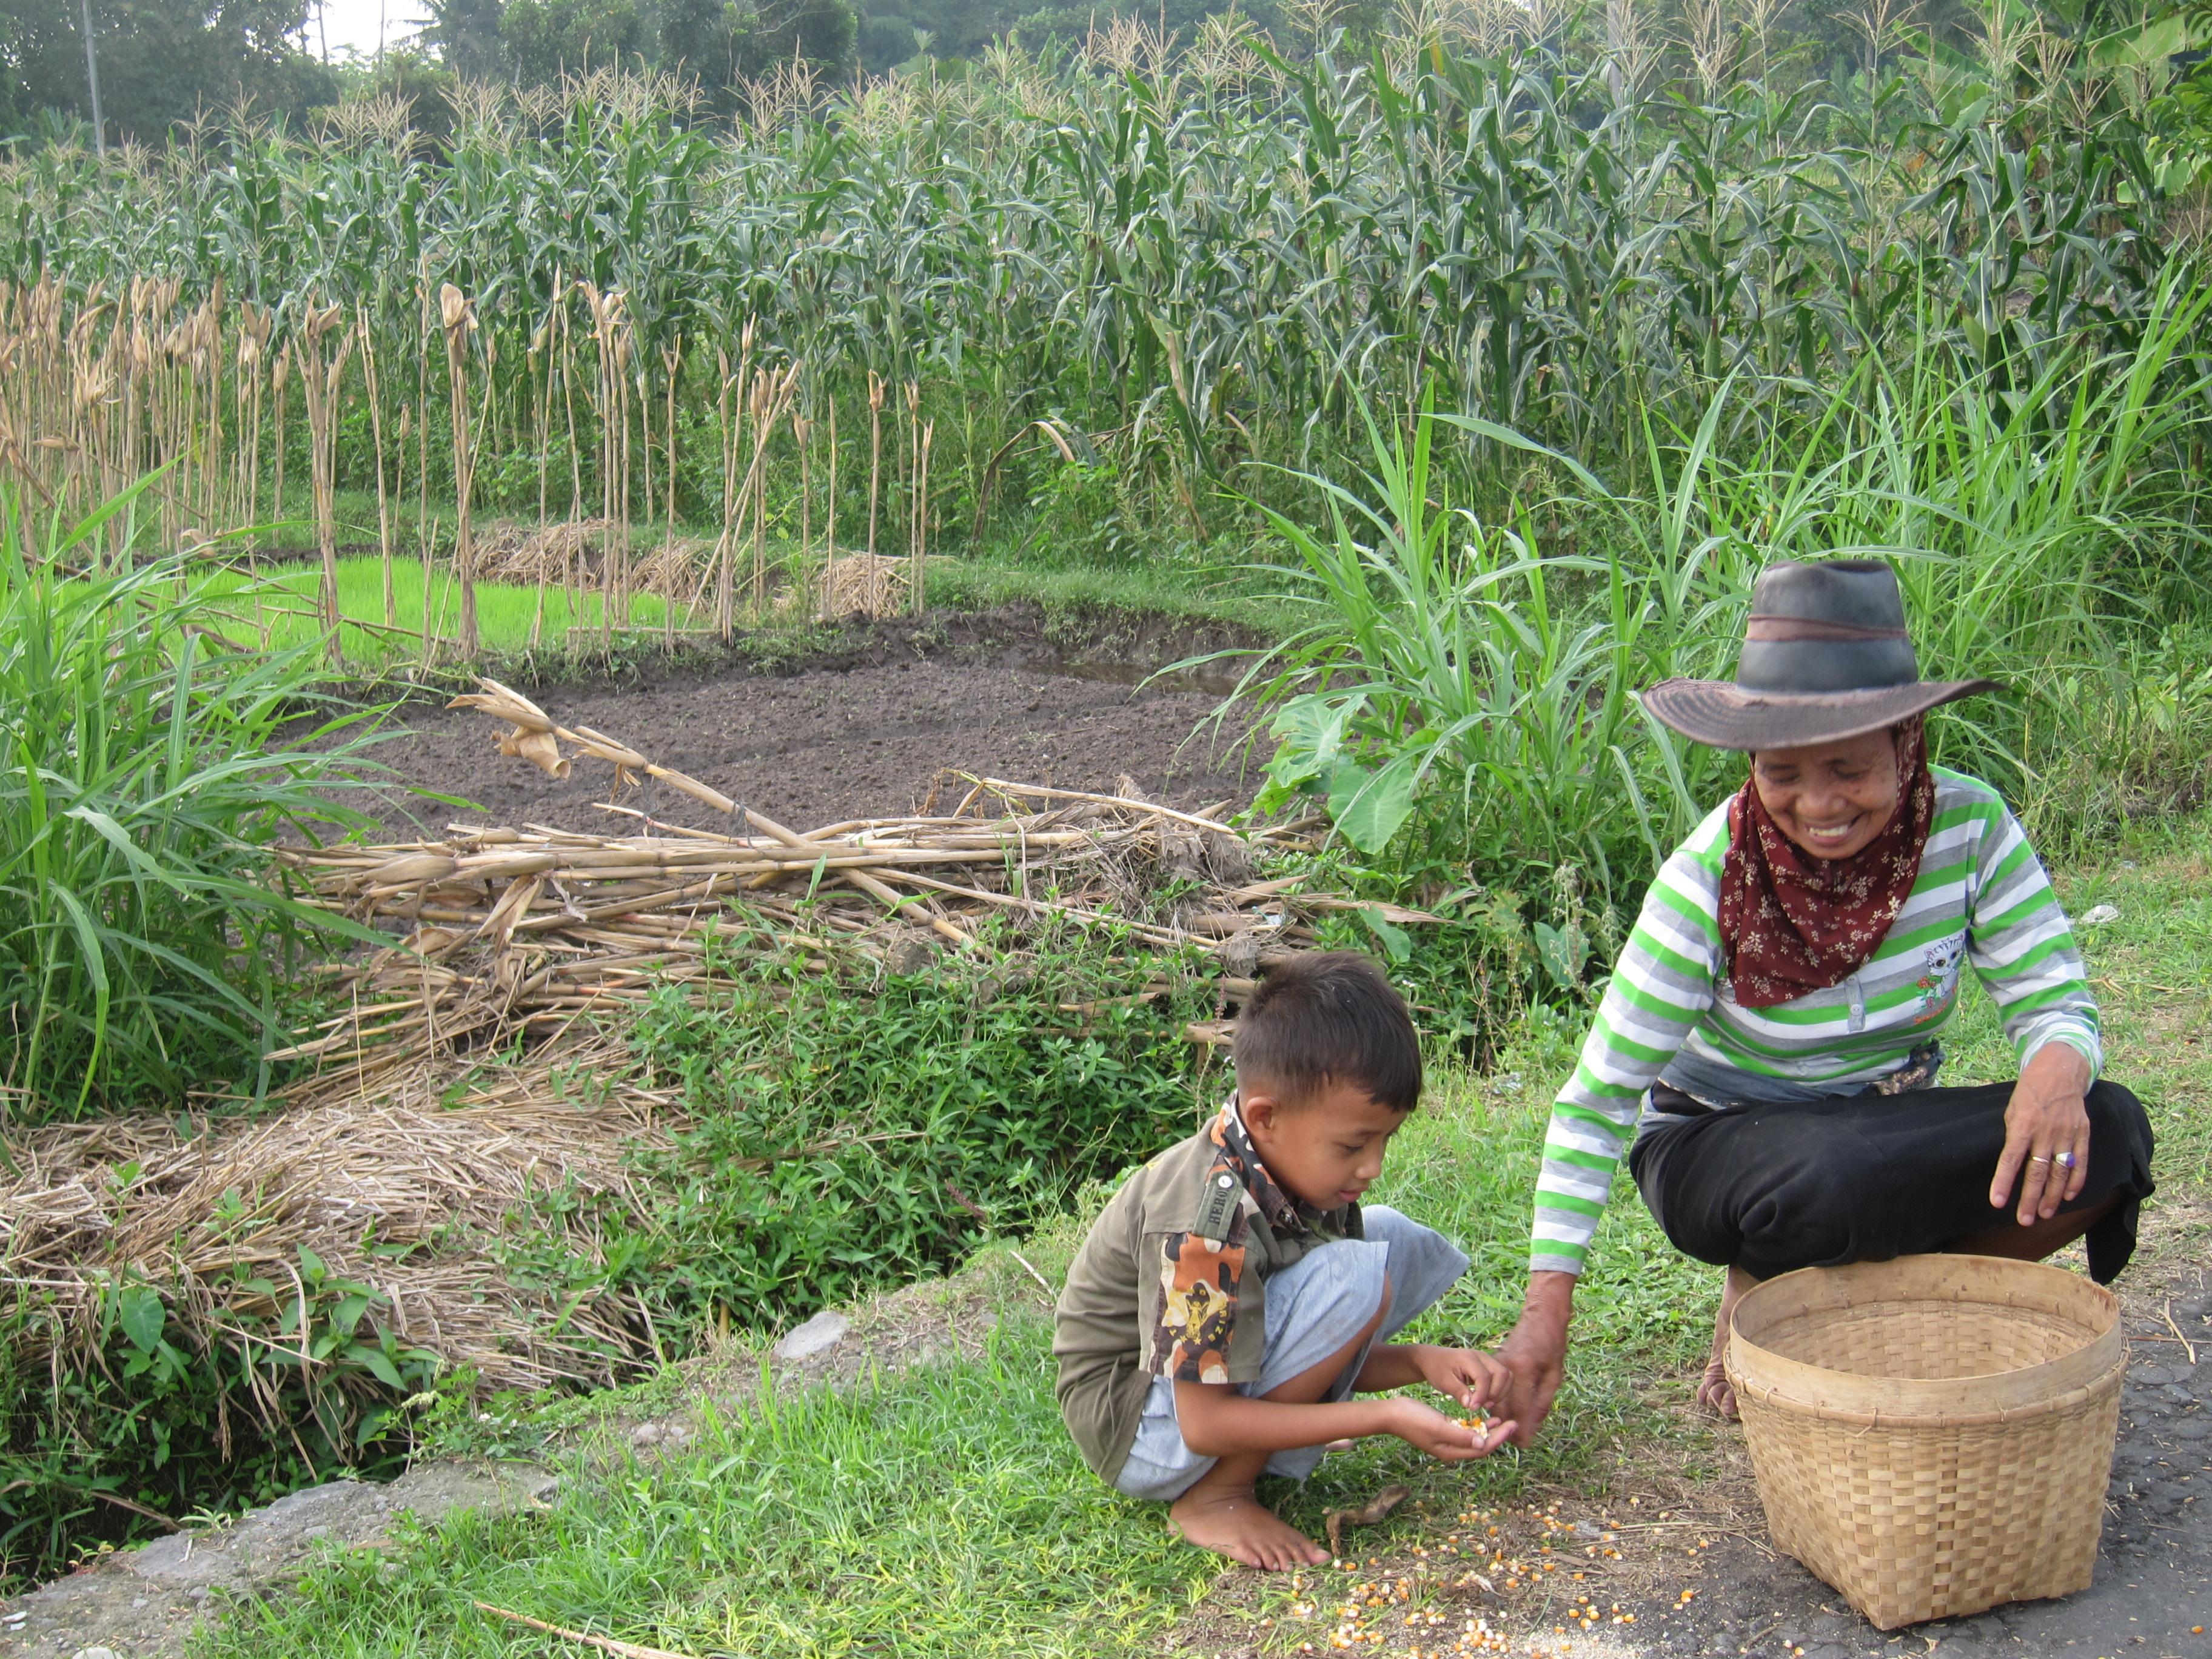 Perempuan yang memunguti biji jagung dengan bocah lelaki cilik saat musim panen di Desa Banyurejo, Kecamatan Tempel, Yogyakarta